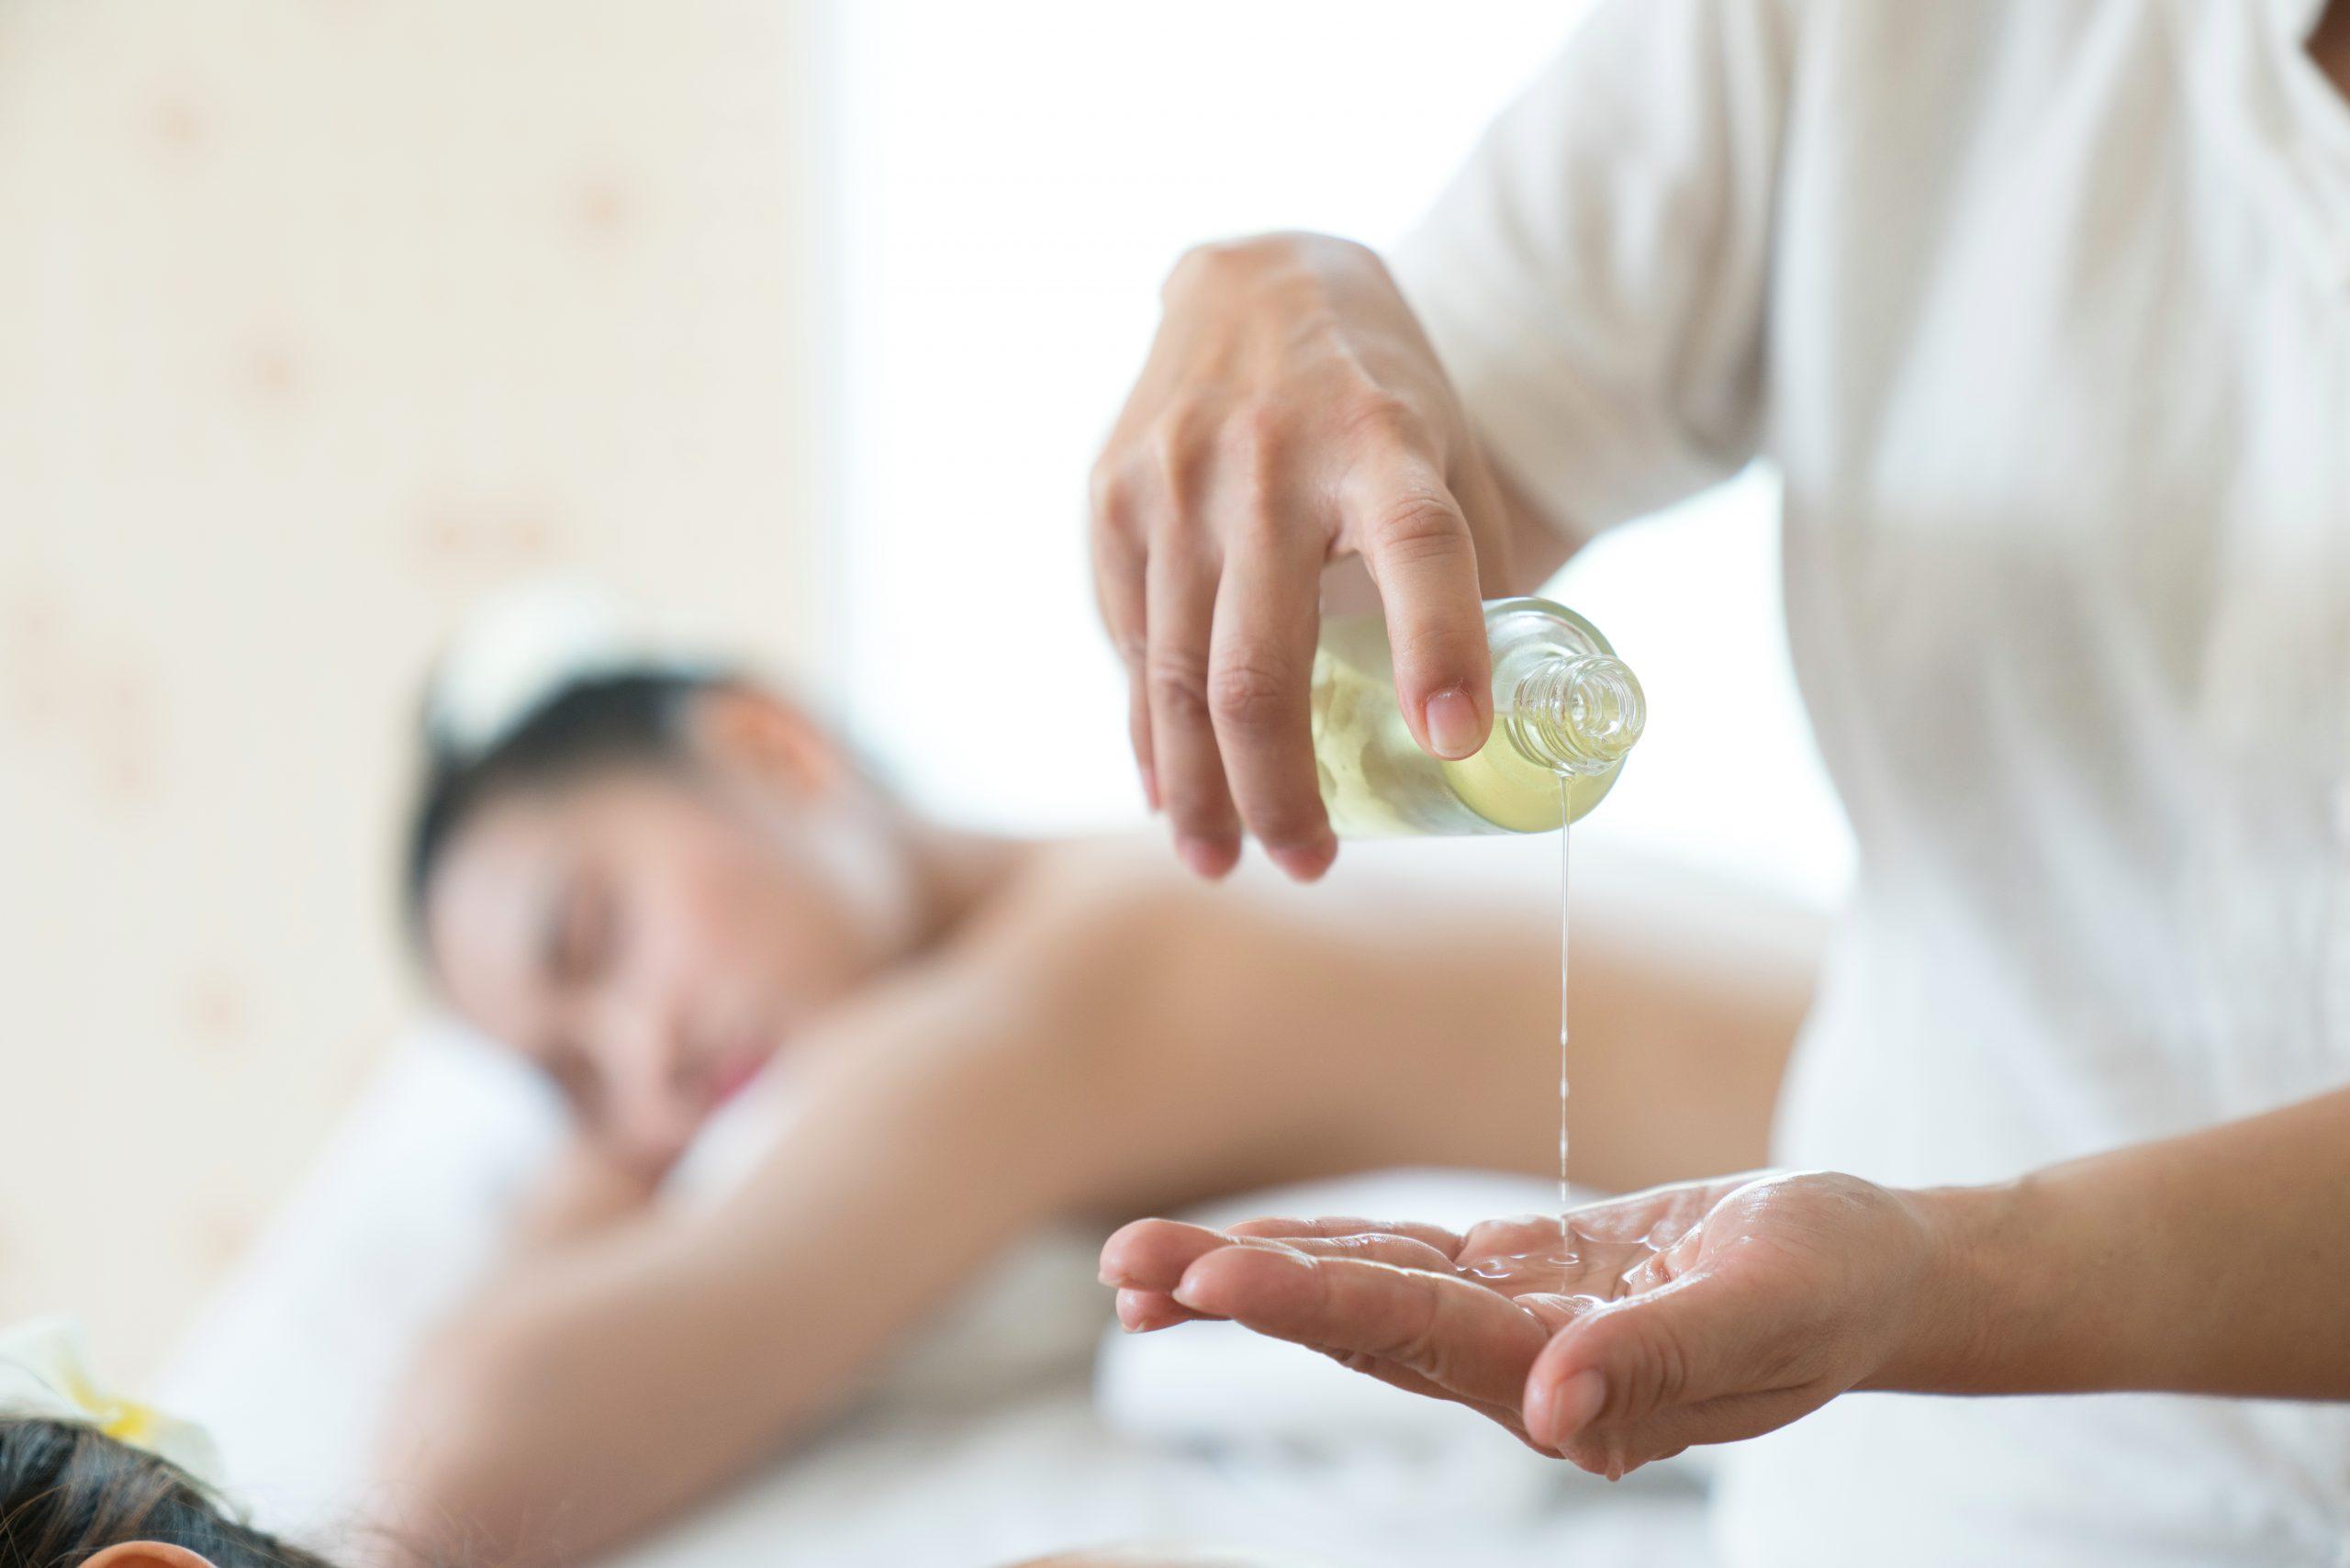 preblend aromatherapy